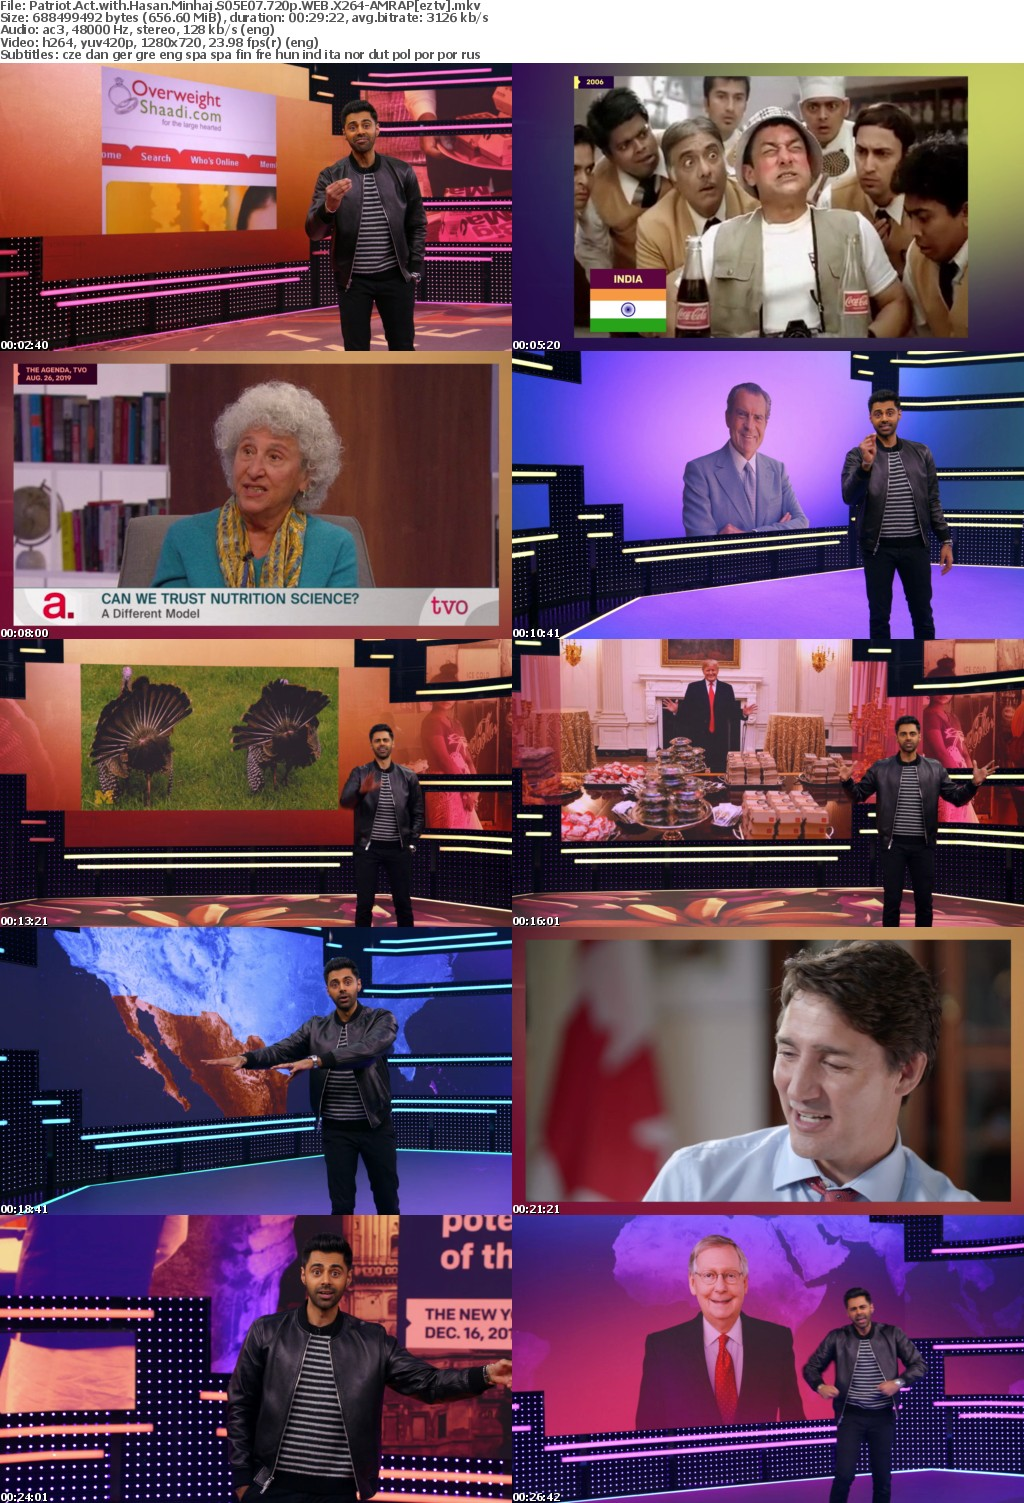 Patriot Act with Hasan Minhaj S05E07 720p WEB X264-AMRAP